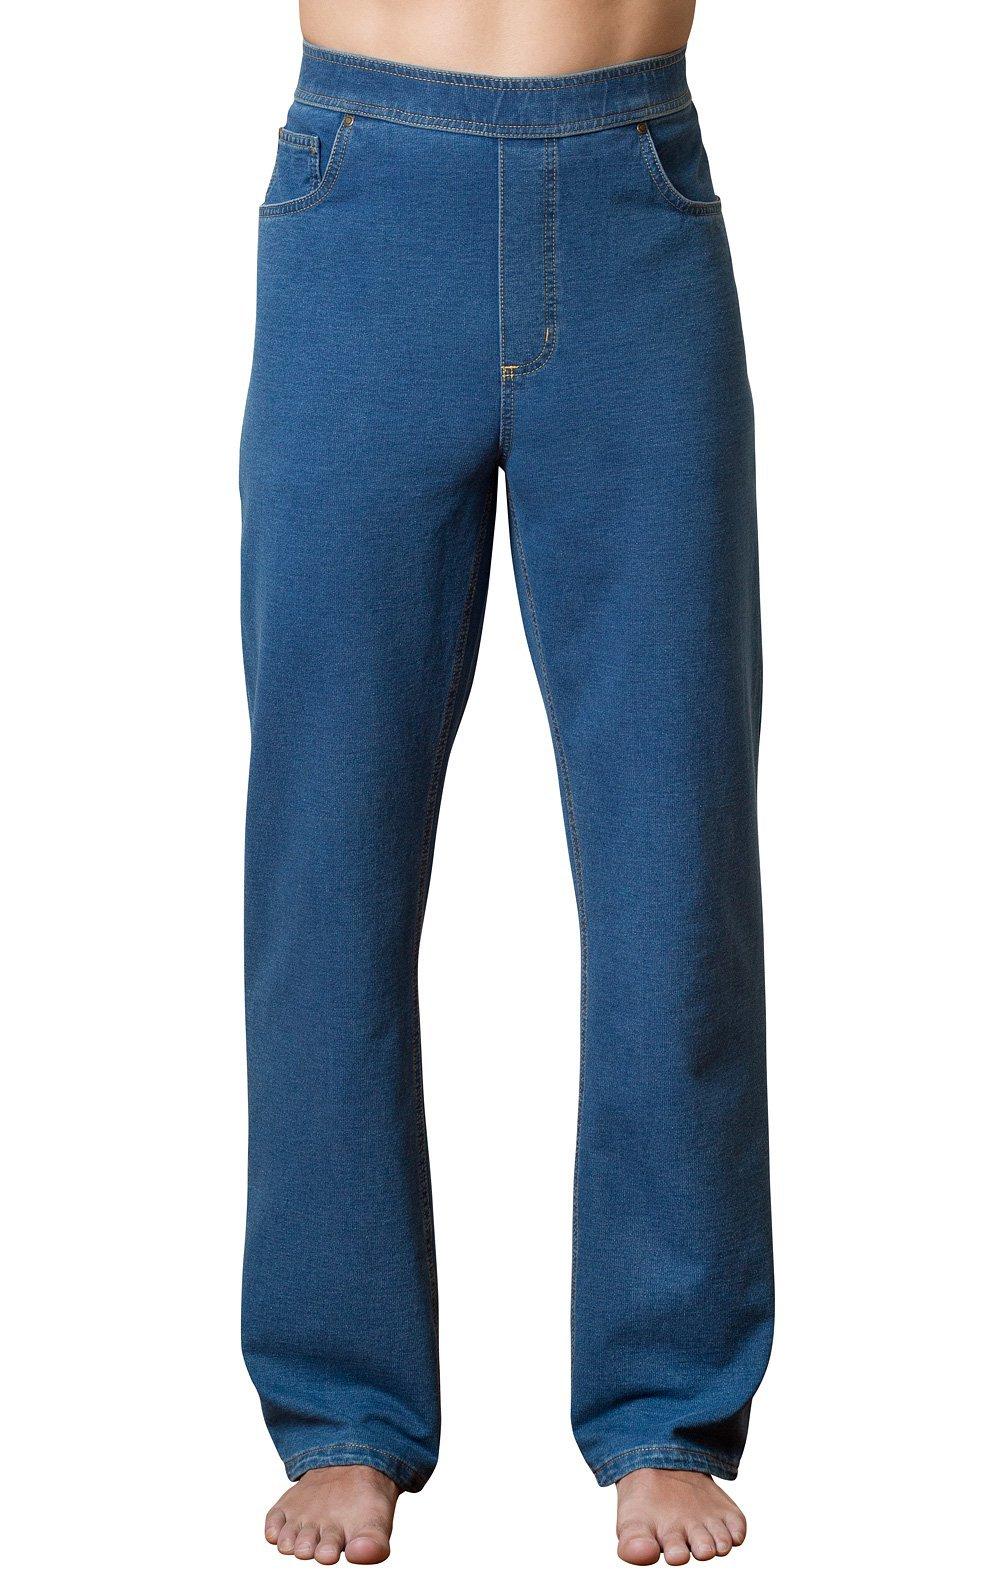 PajamaJeans Men's Straight Leg Knit Denim Jeans in Blue, Pacific Wash, Large